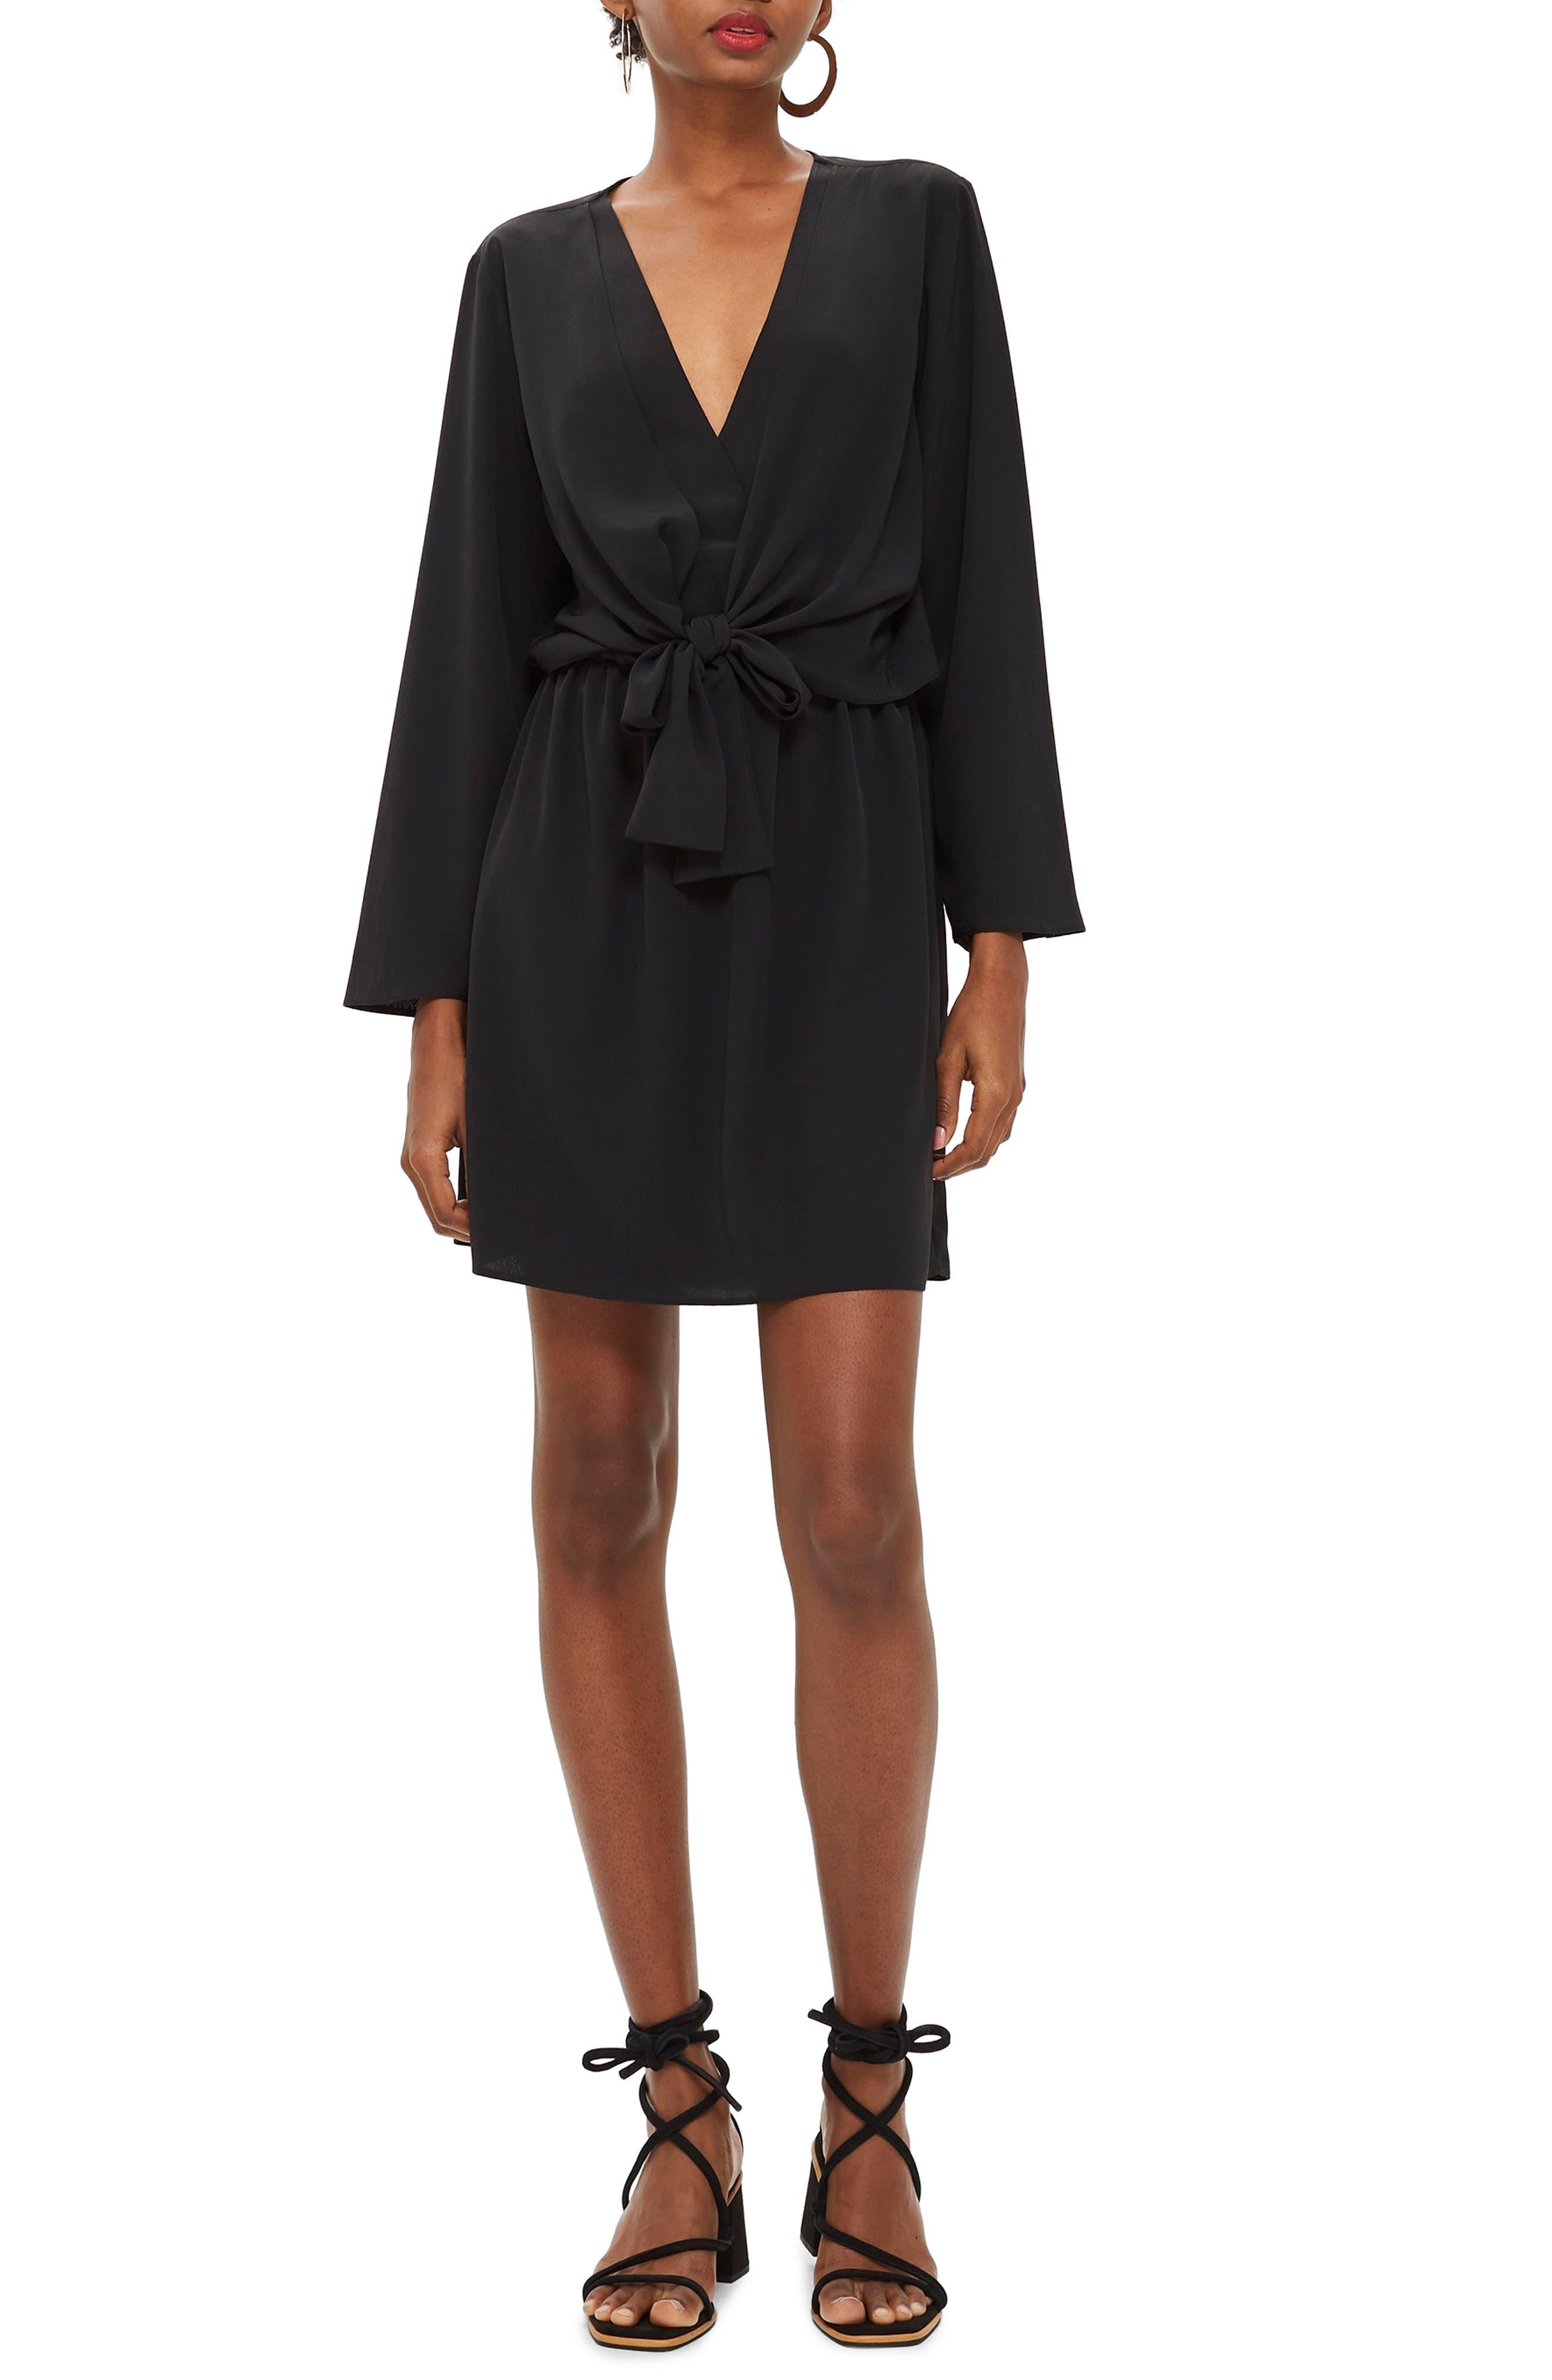 86834060c3d Topshop Women s Dresses